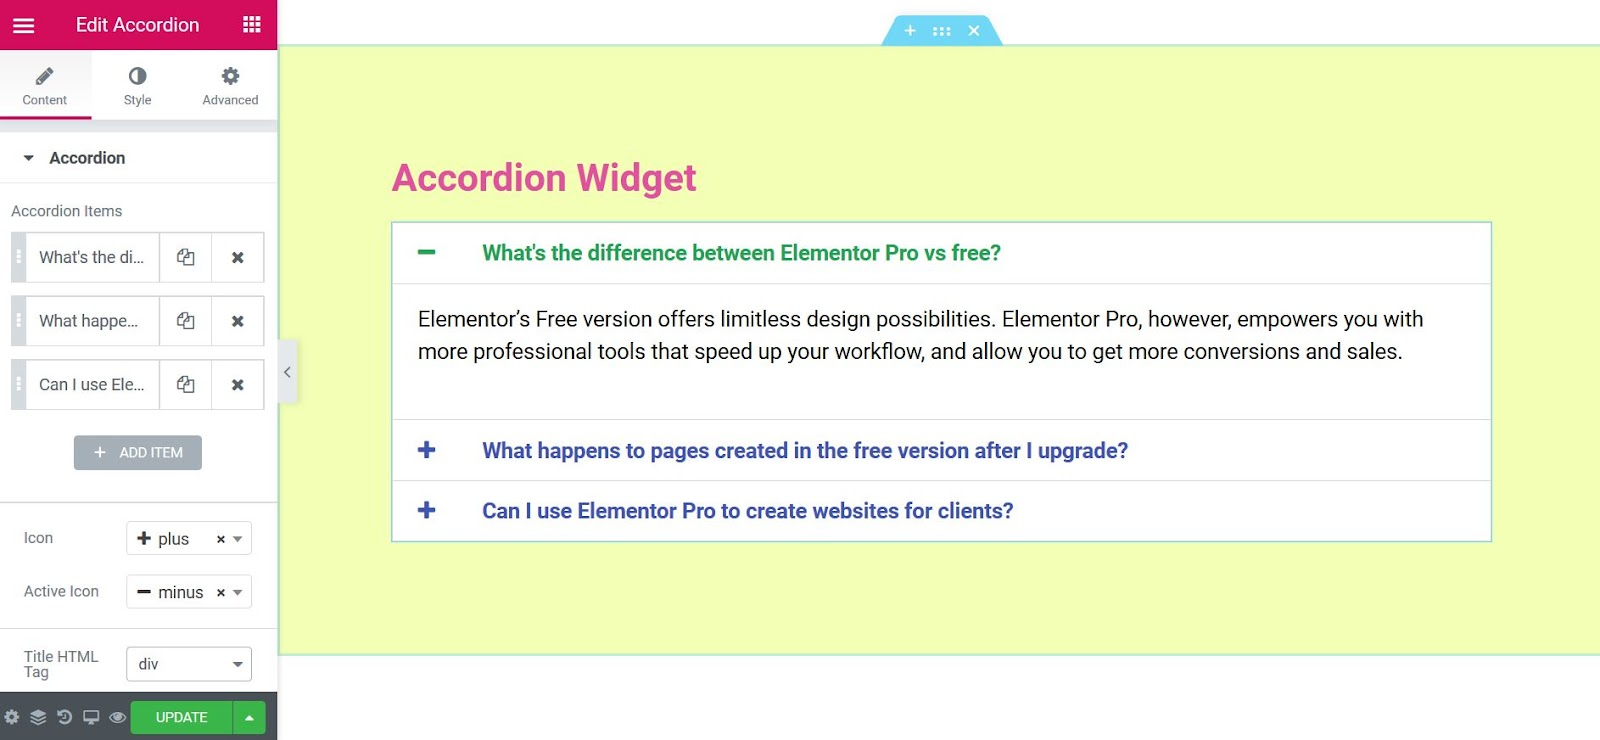 Accordion Widget - Docs | Elementor